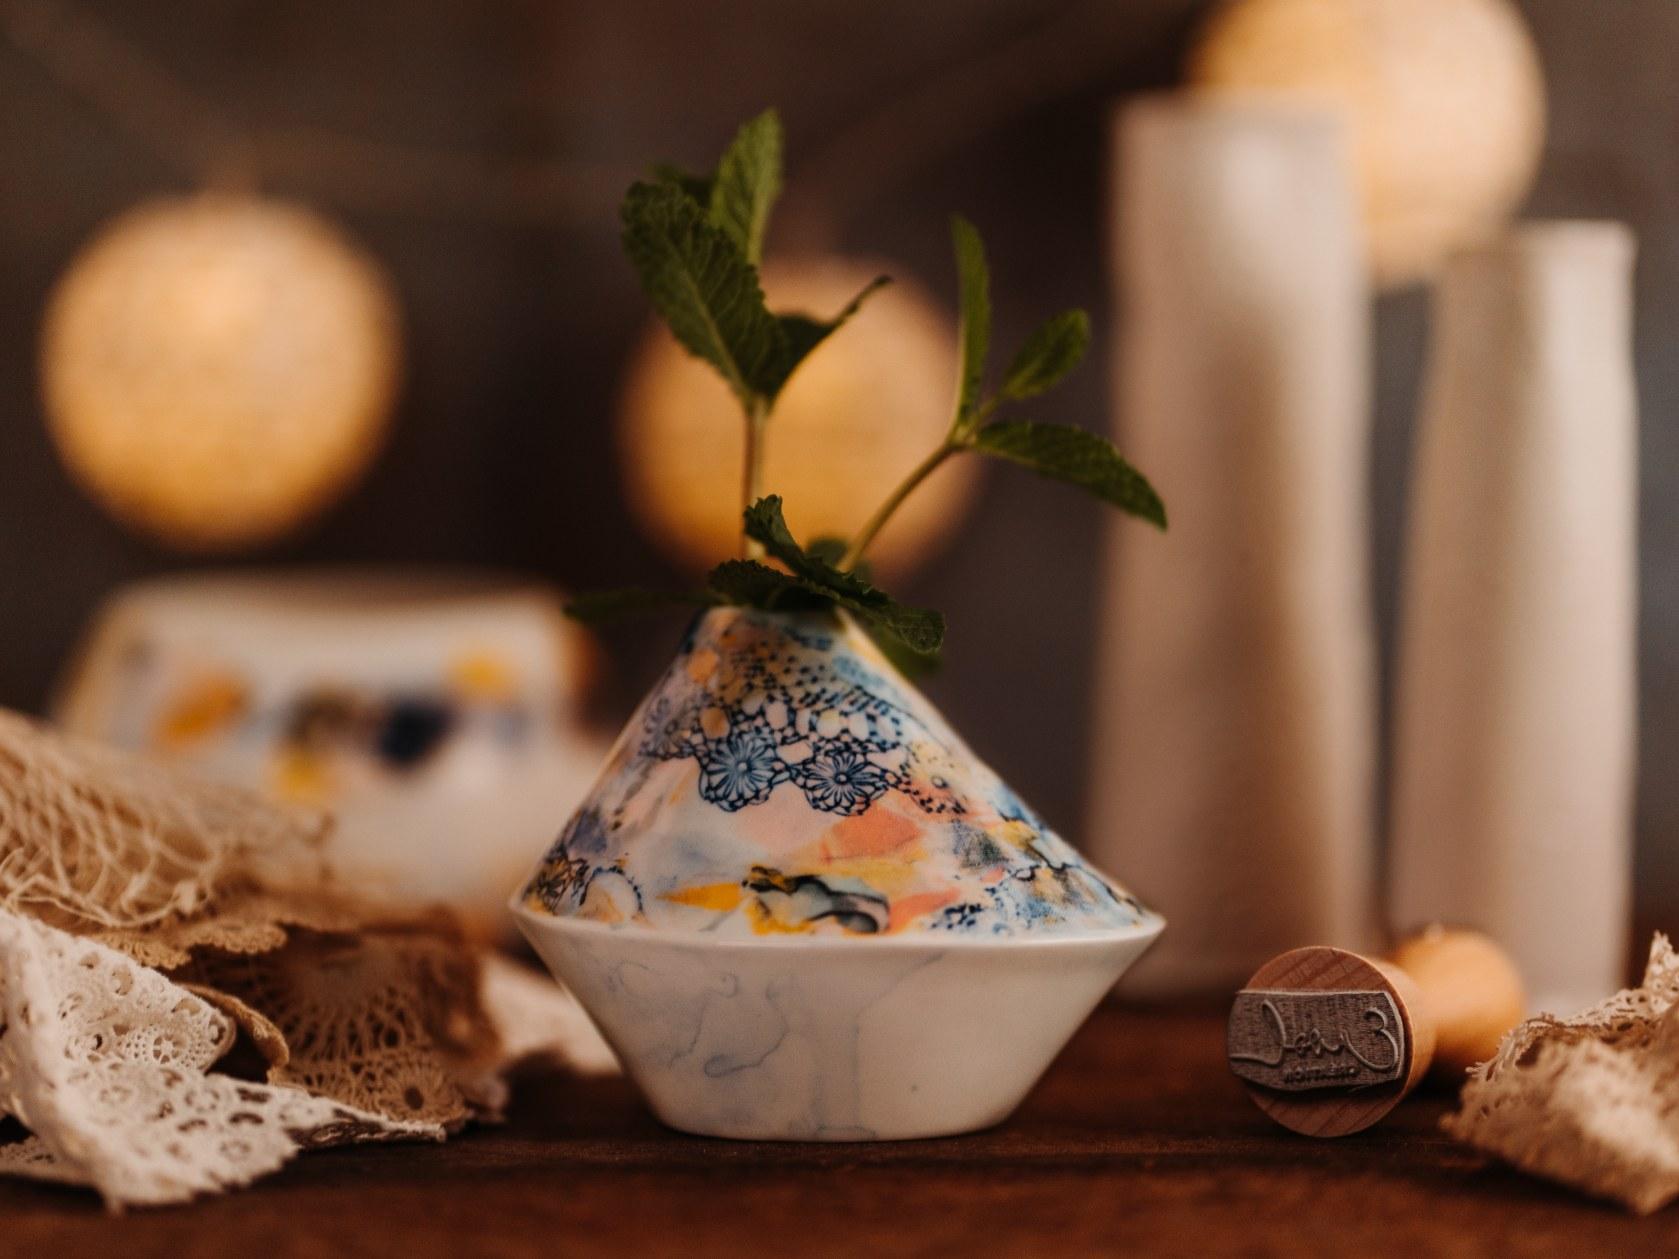 Collection Burano- soliflore triangle- vase dentelle colorée- Photo Ambiance- sans logo